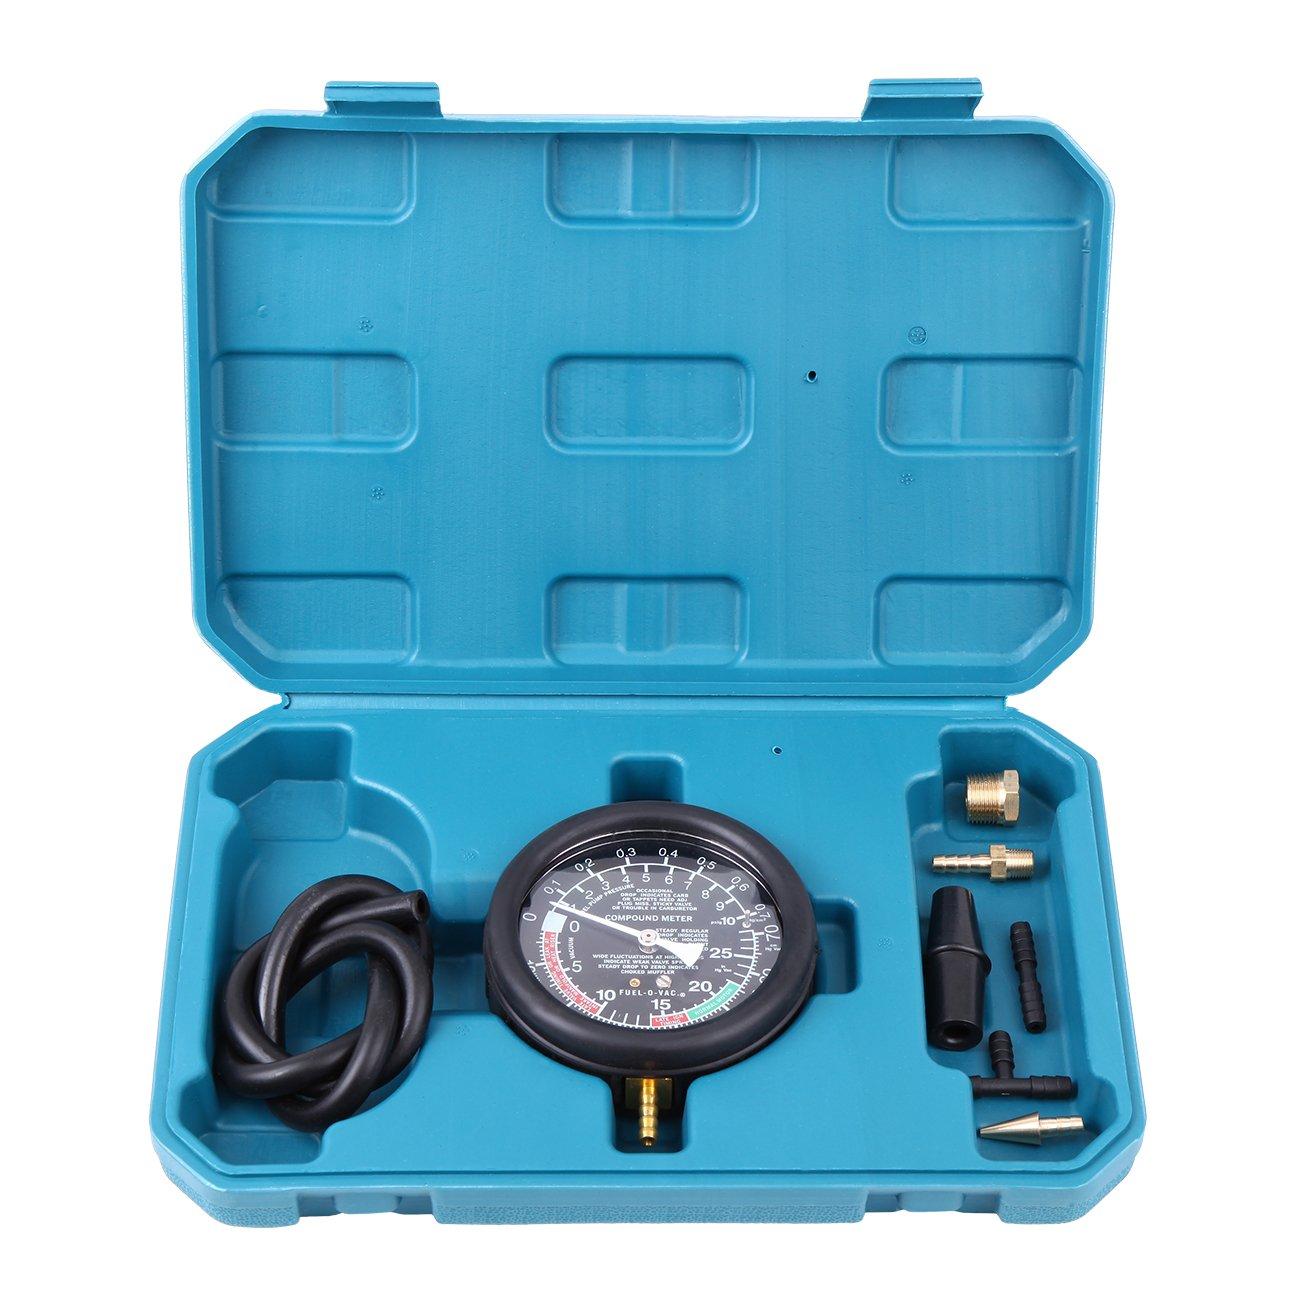 Ambienceo Car Fuel Pump & Valve Vacuum Tester Carburetor Pressure Diagnostic Test Gauge Tool Set